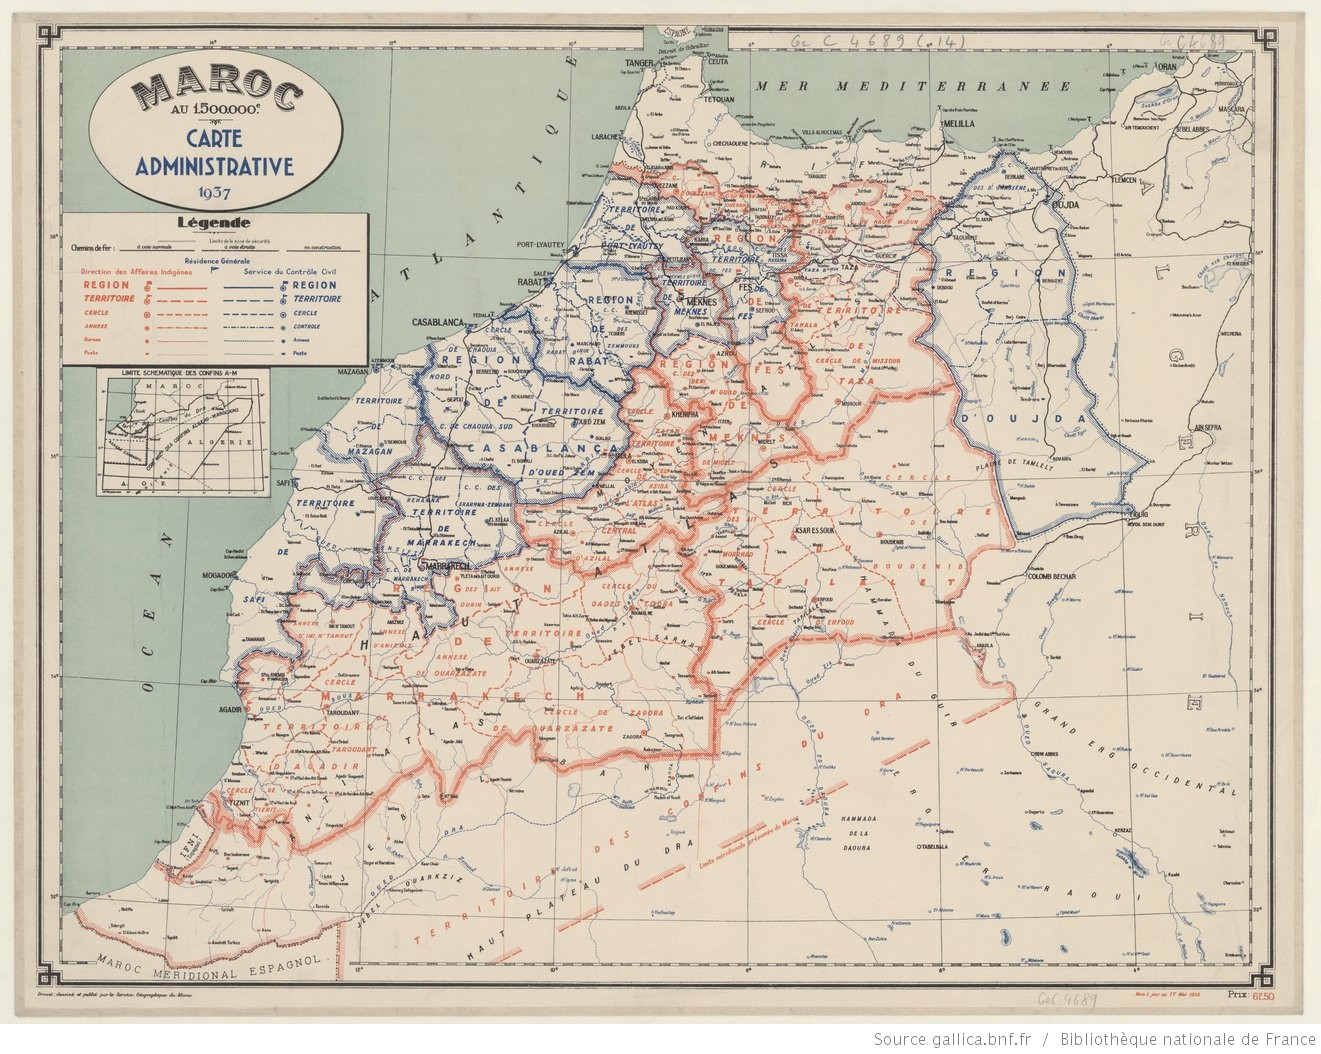 1938-carte-administrative-maroc.JPEG